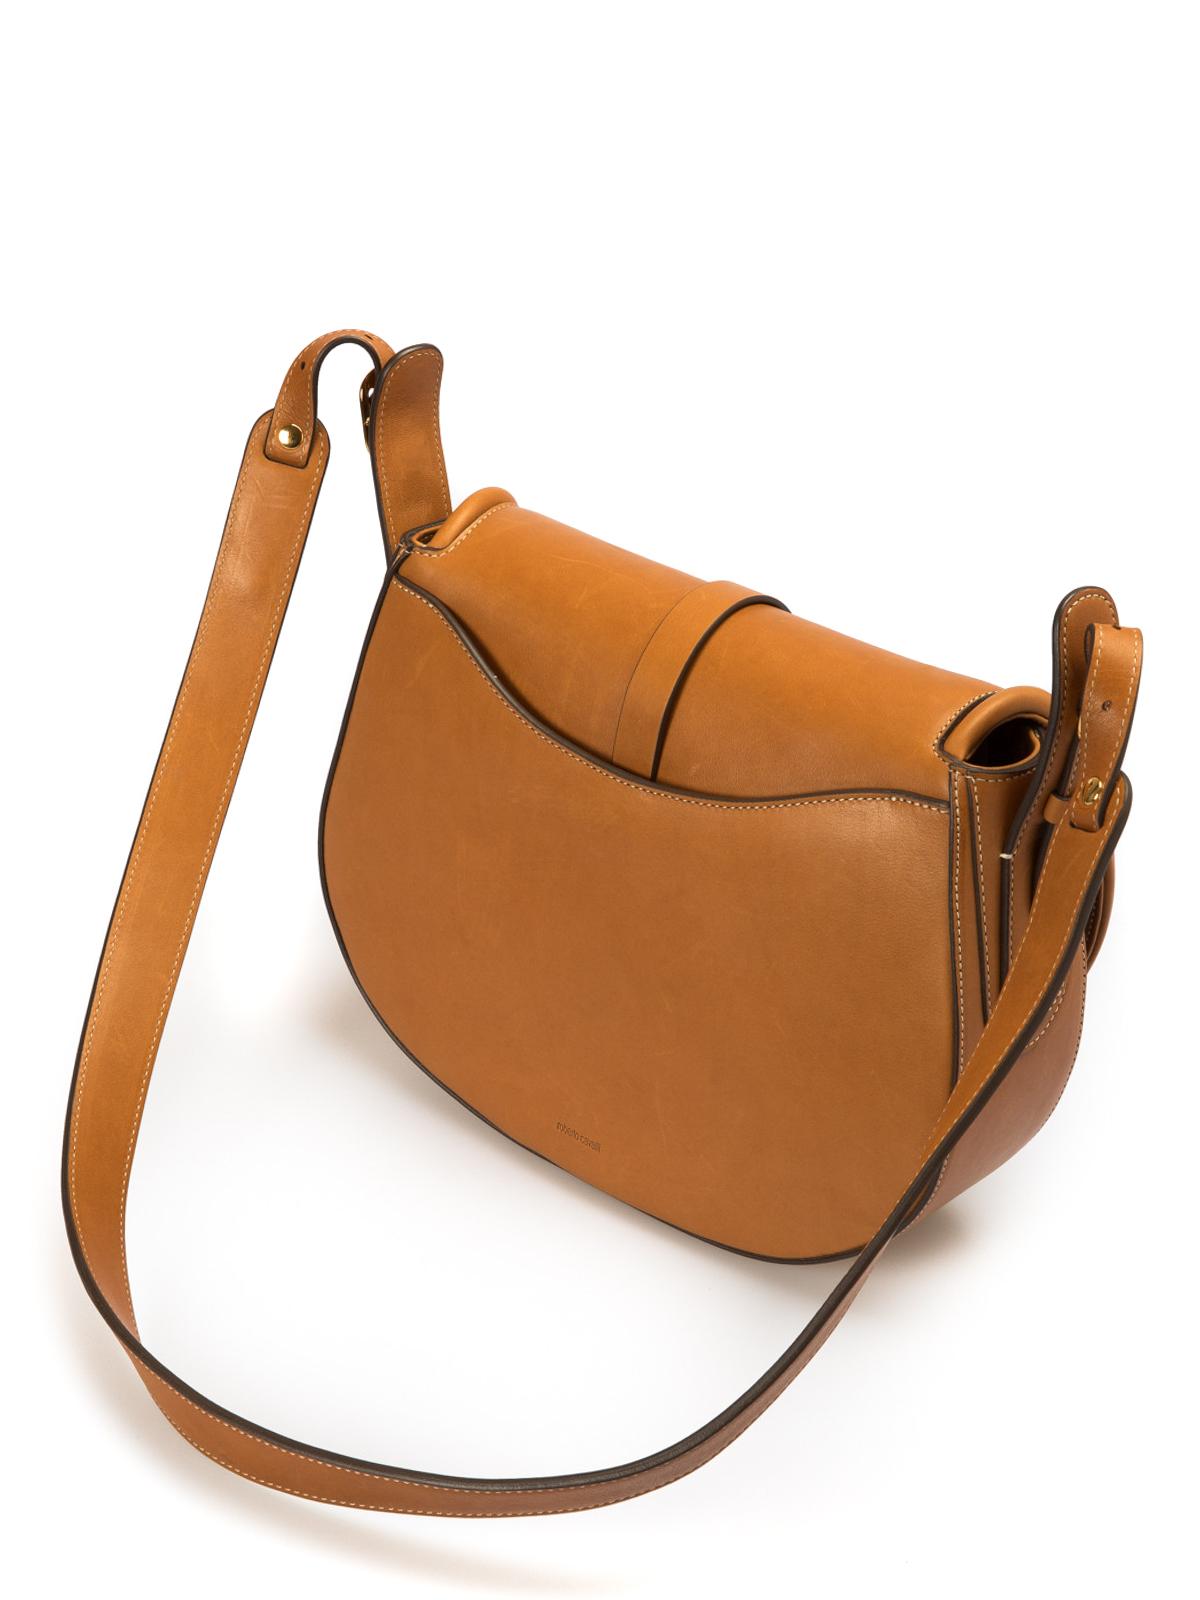 1cd4c1107a7f iKRIX ROBERTO CAVALLI  shoulder bags - Smooth leather horn detailed bag